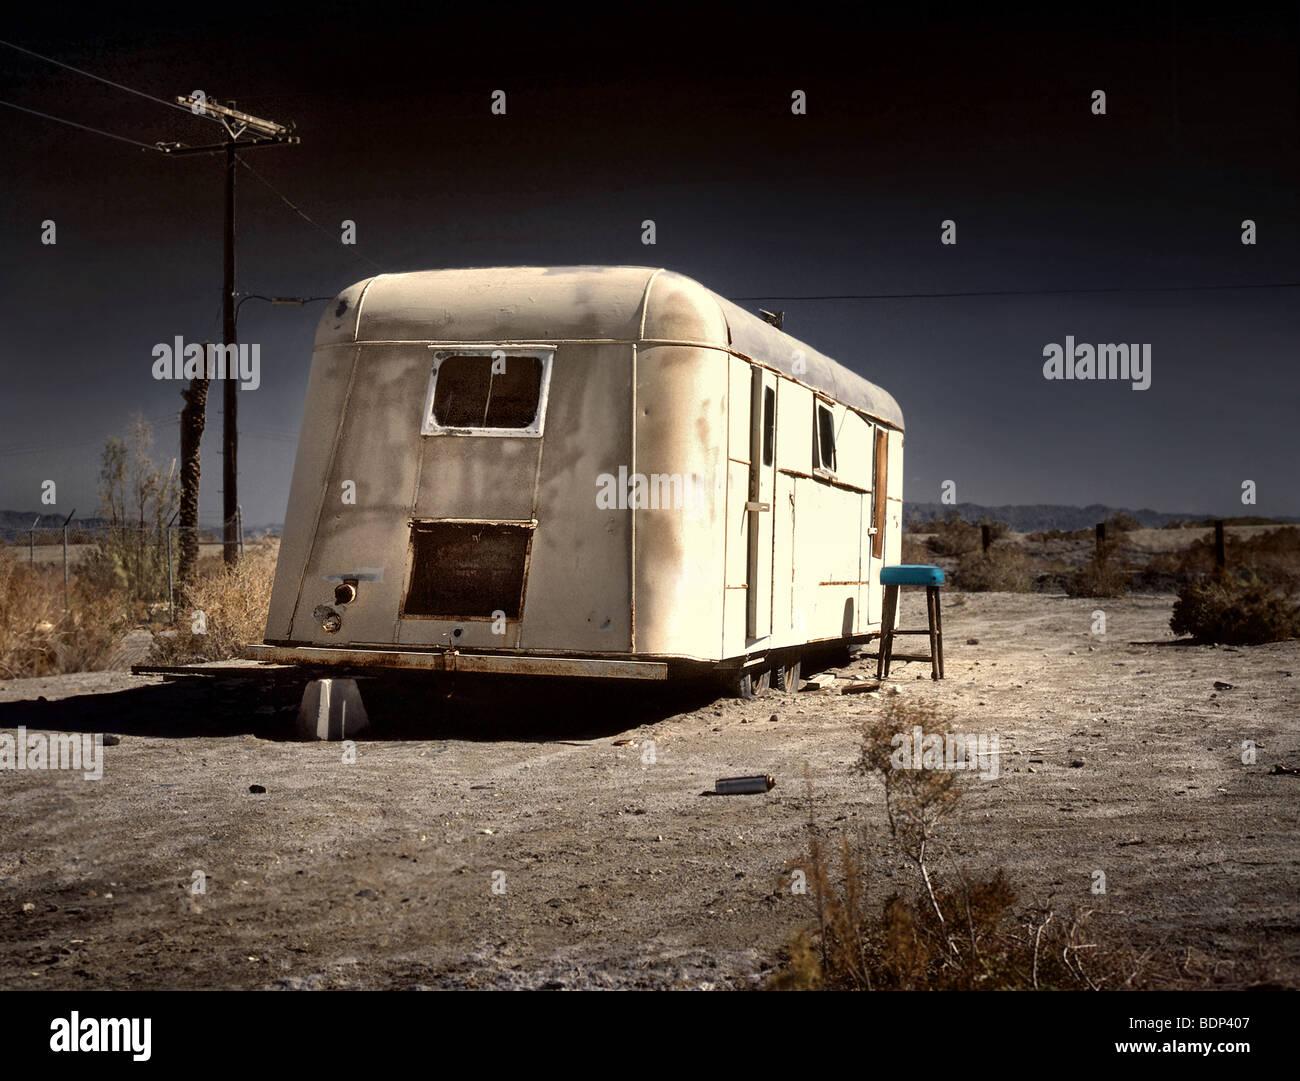 An old white caravan left to rot in the desert - Stock Image